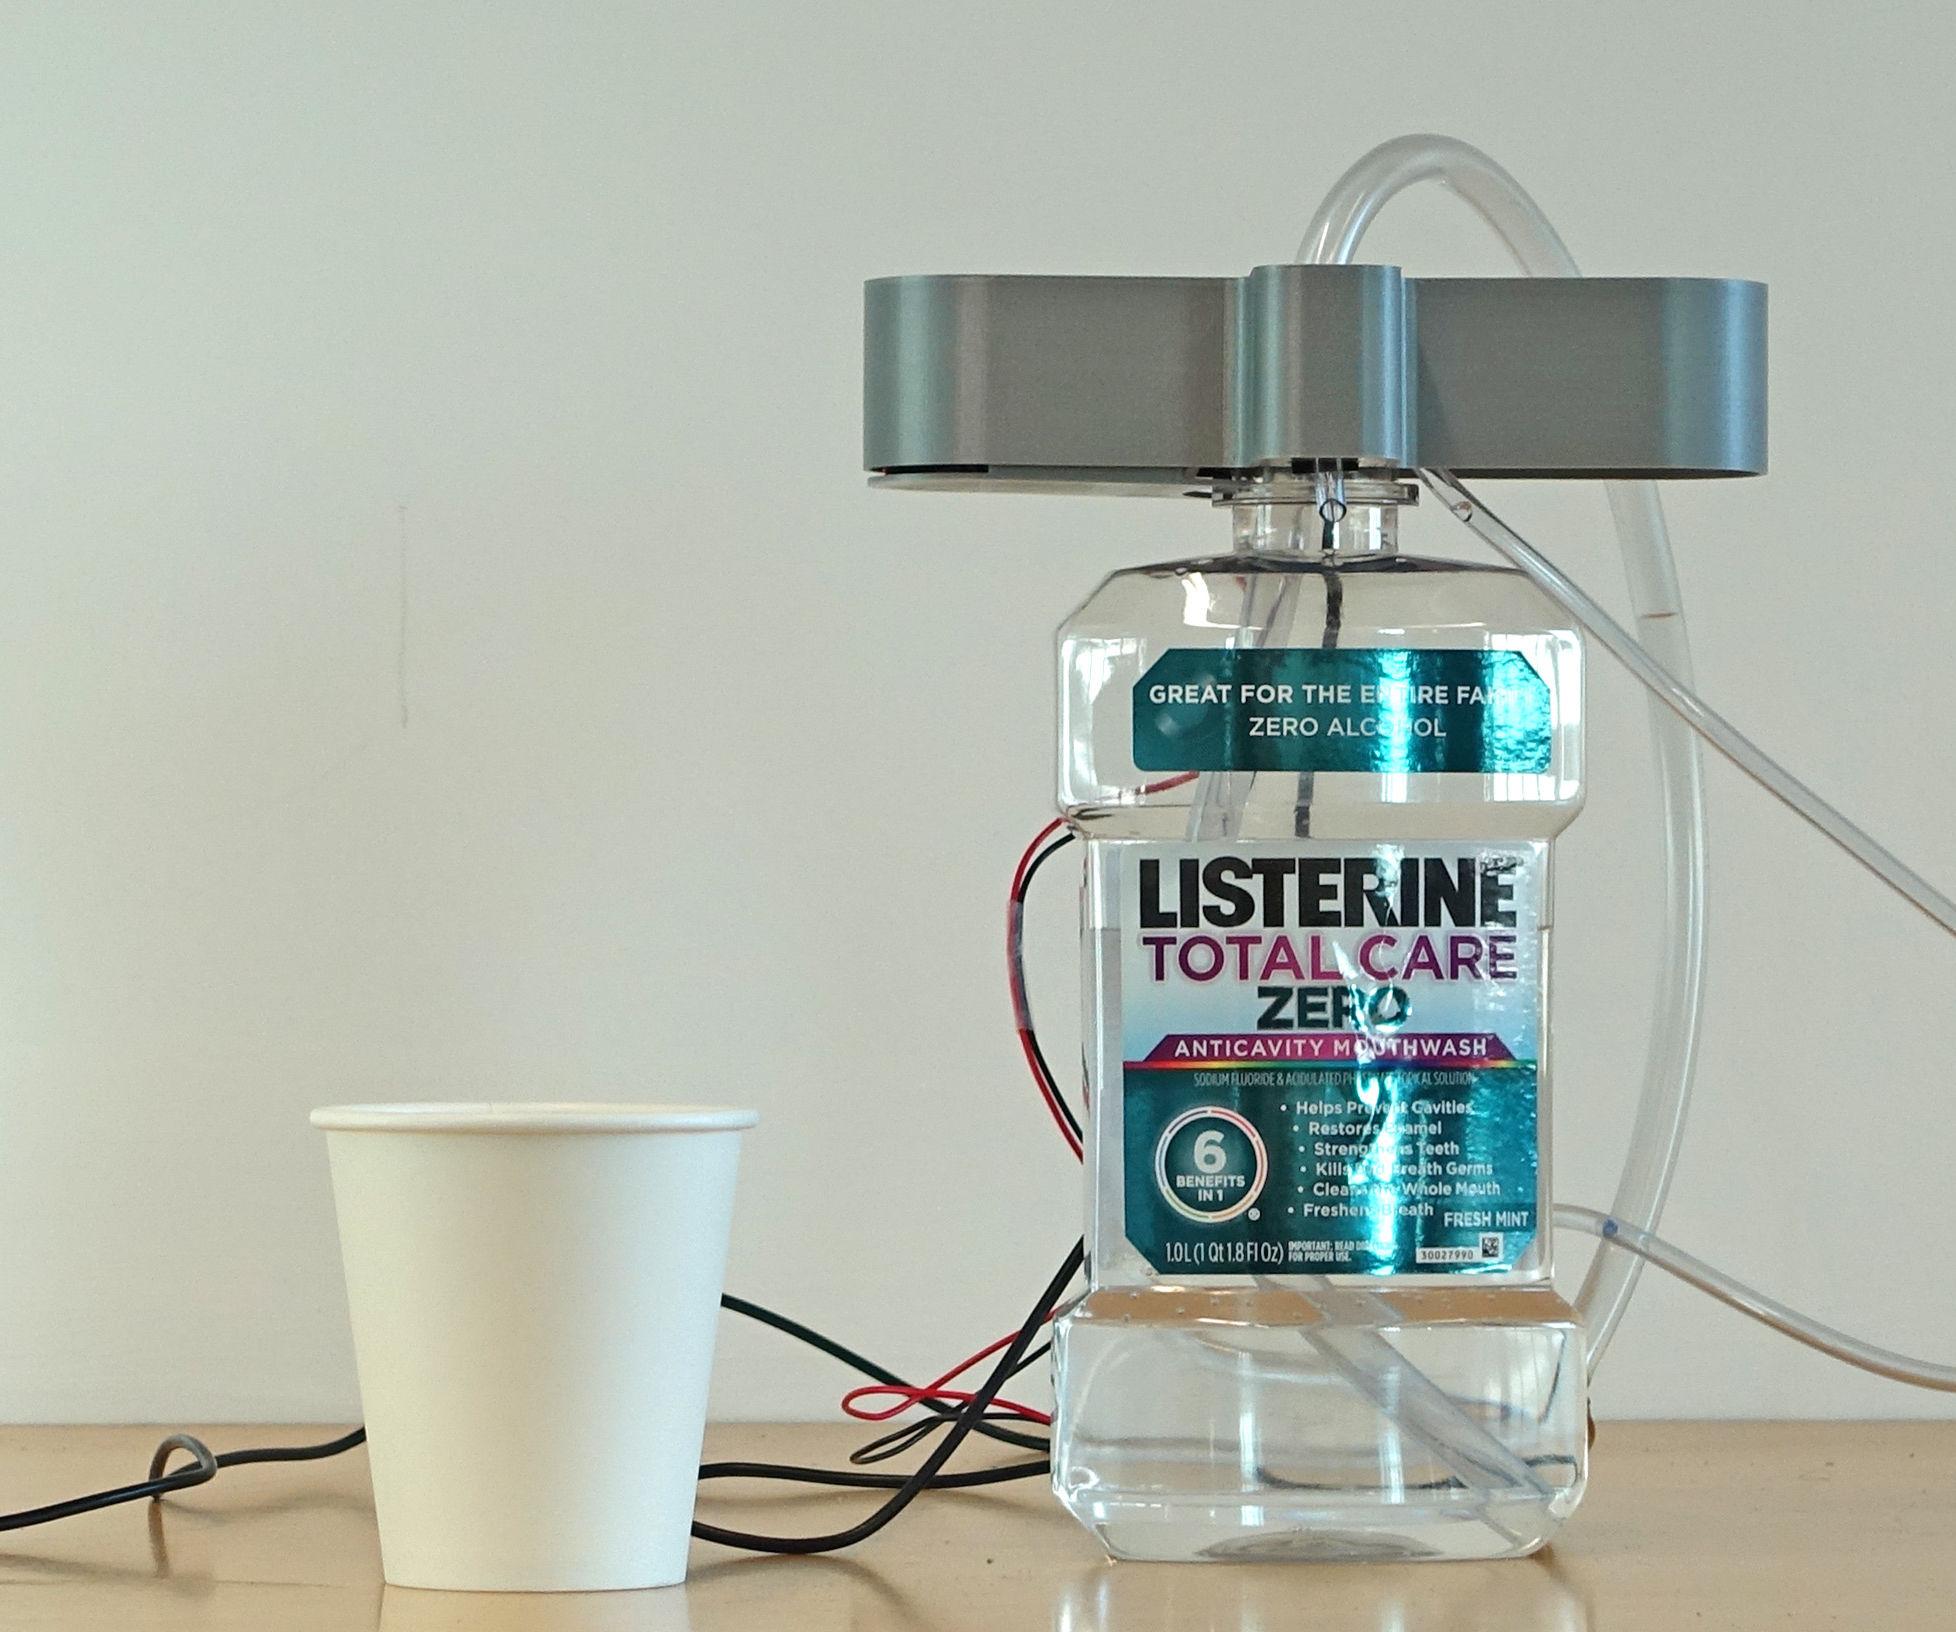 Smart Mouthwash Dispenser: Dispenses the Right Amount Based on the Stinky Level